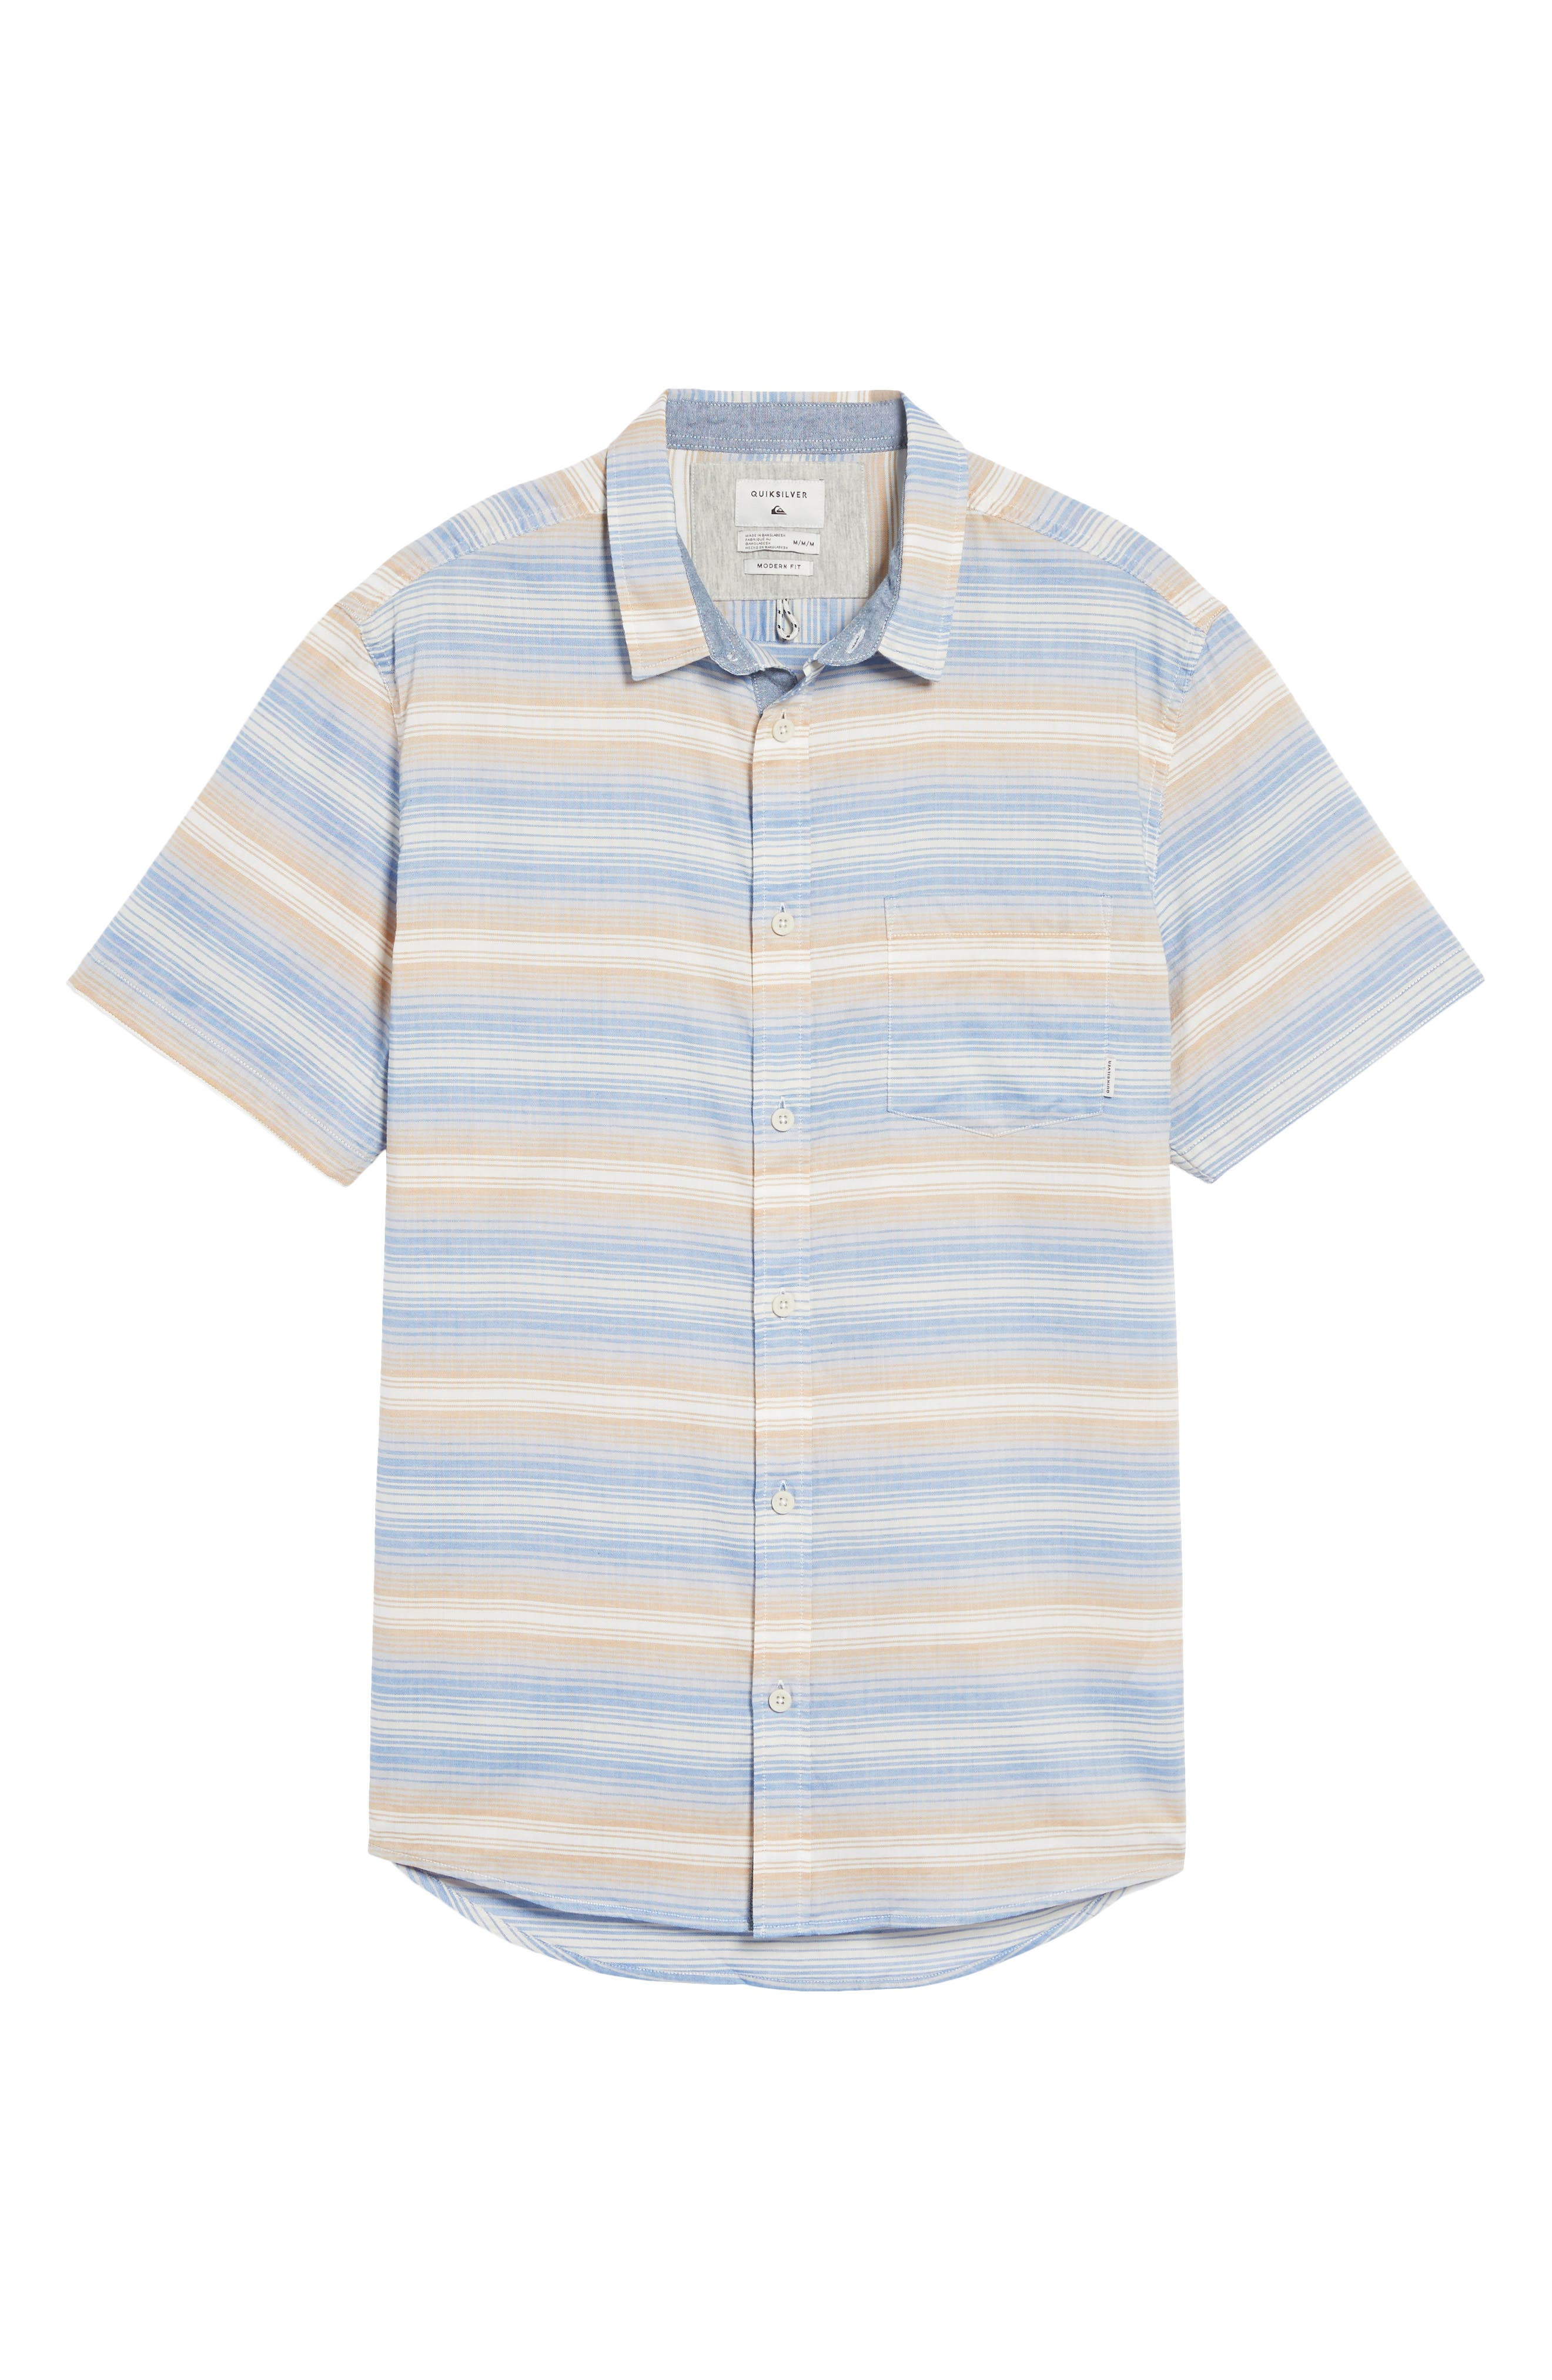 Aventail Stripe Shirt,                             Alternate thumbnail 12, color,